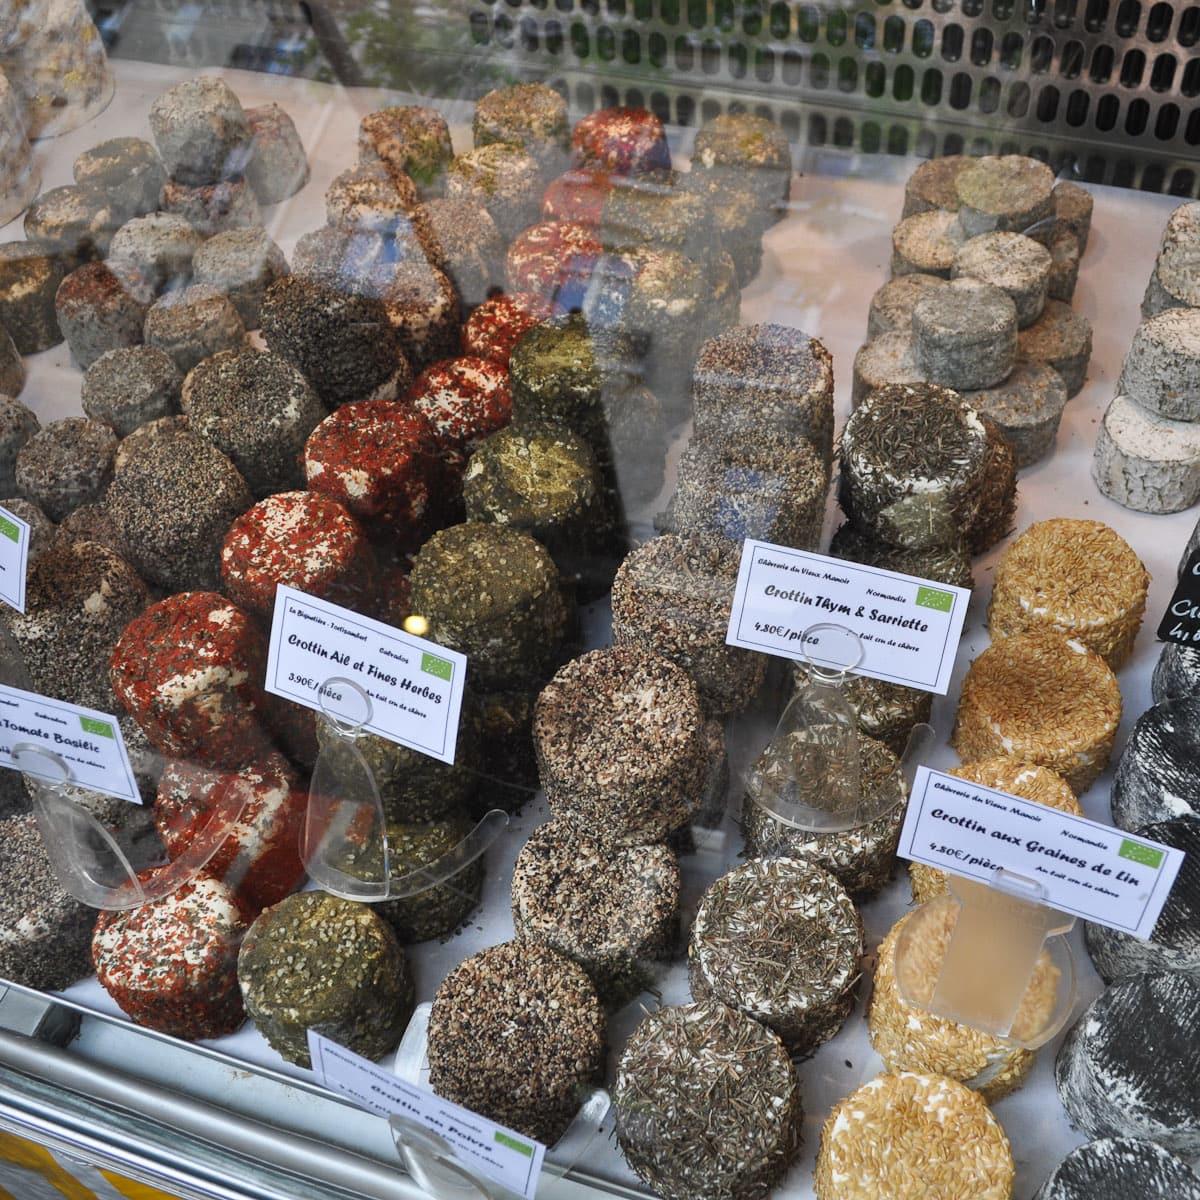 News_Paris farmers market